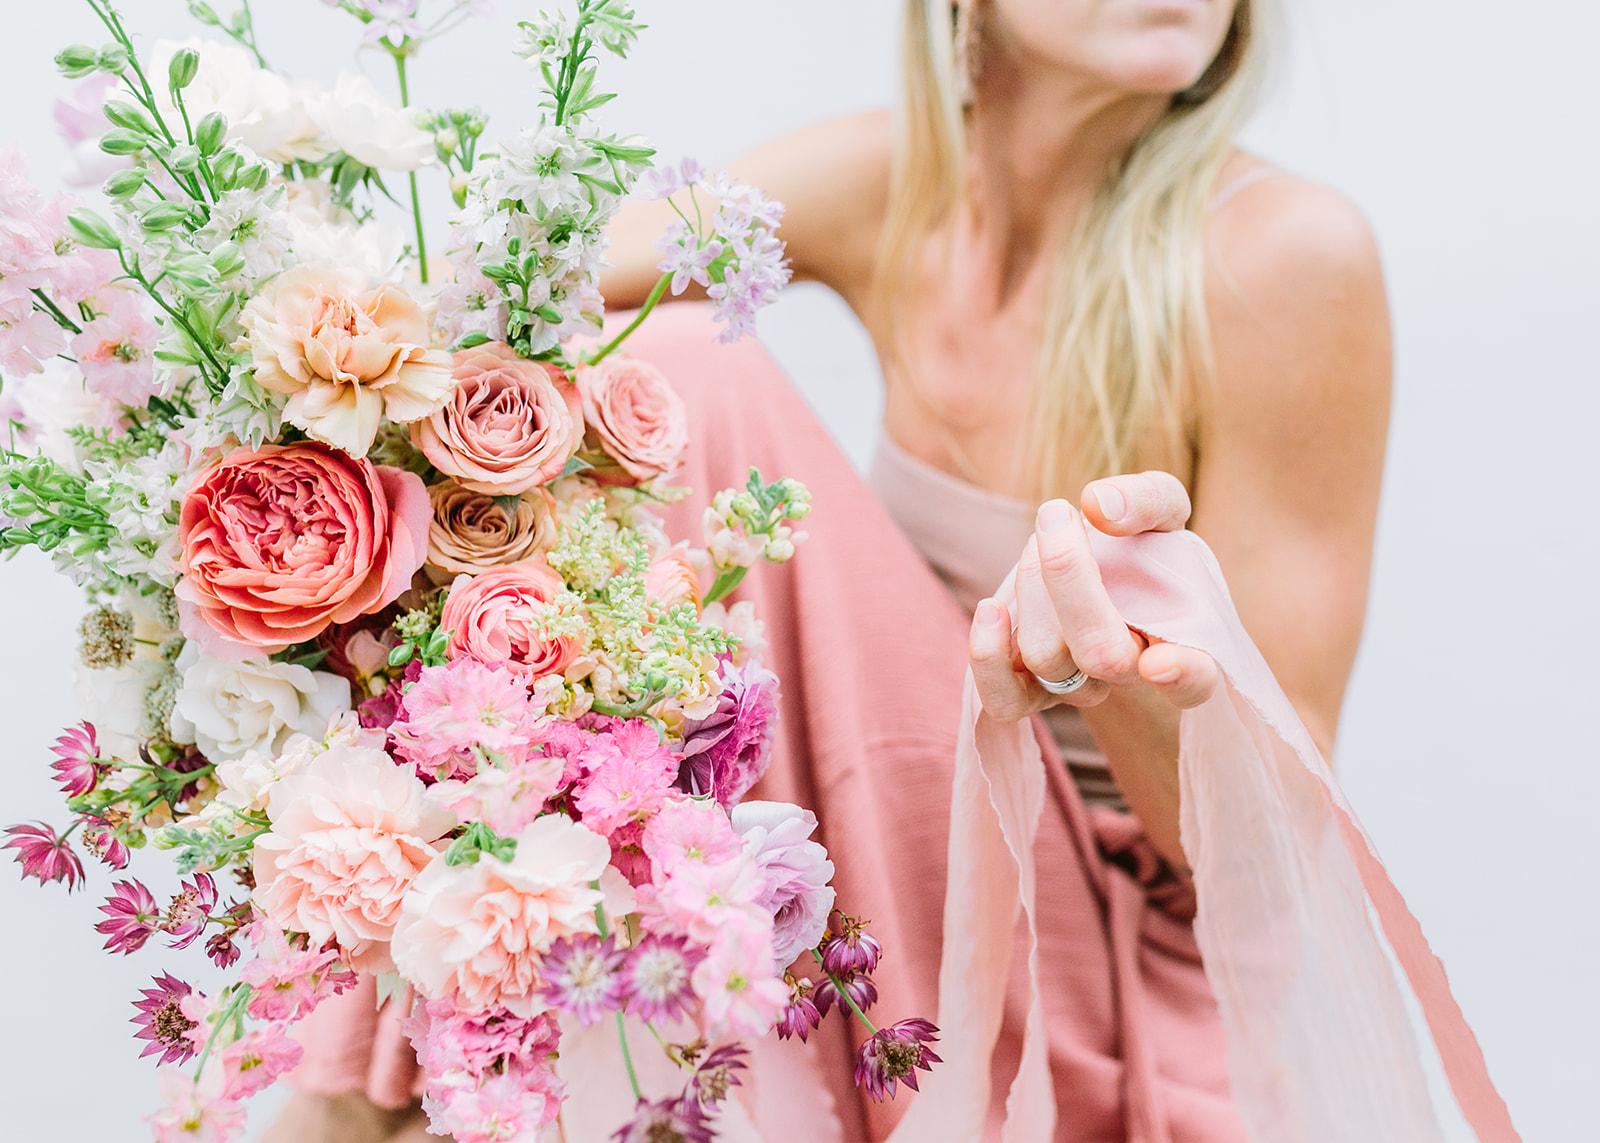 Nectar-Bloom-Mentorship-Mandy-Ford-75.jpg